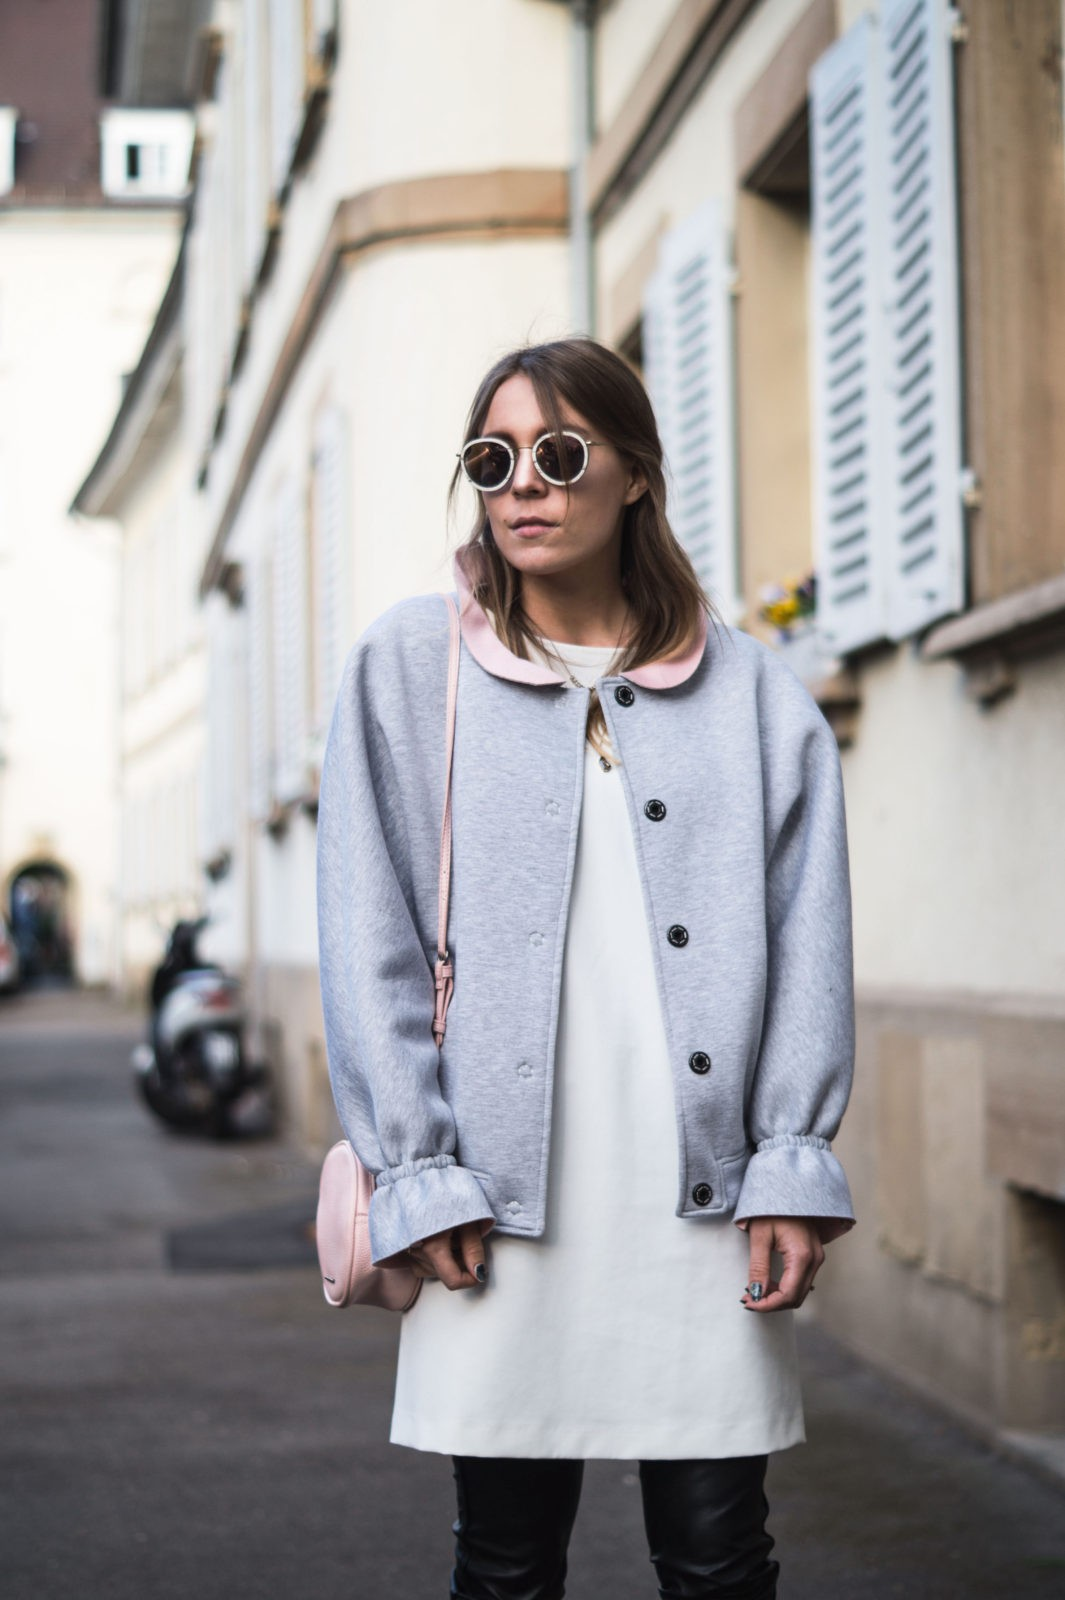 Gray-Bomber-Jacket-Bomberjacke-Grau-Rueschen-Rosa-Modeblog-Heidelberg-Fashionblogger-Sariety-Streetstyle-Liebesglueck-Kerbholz